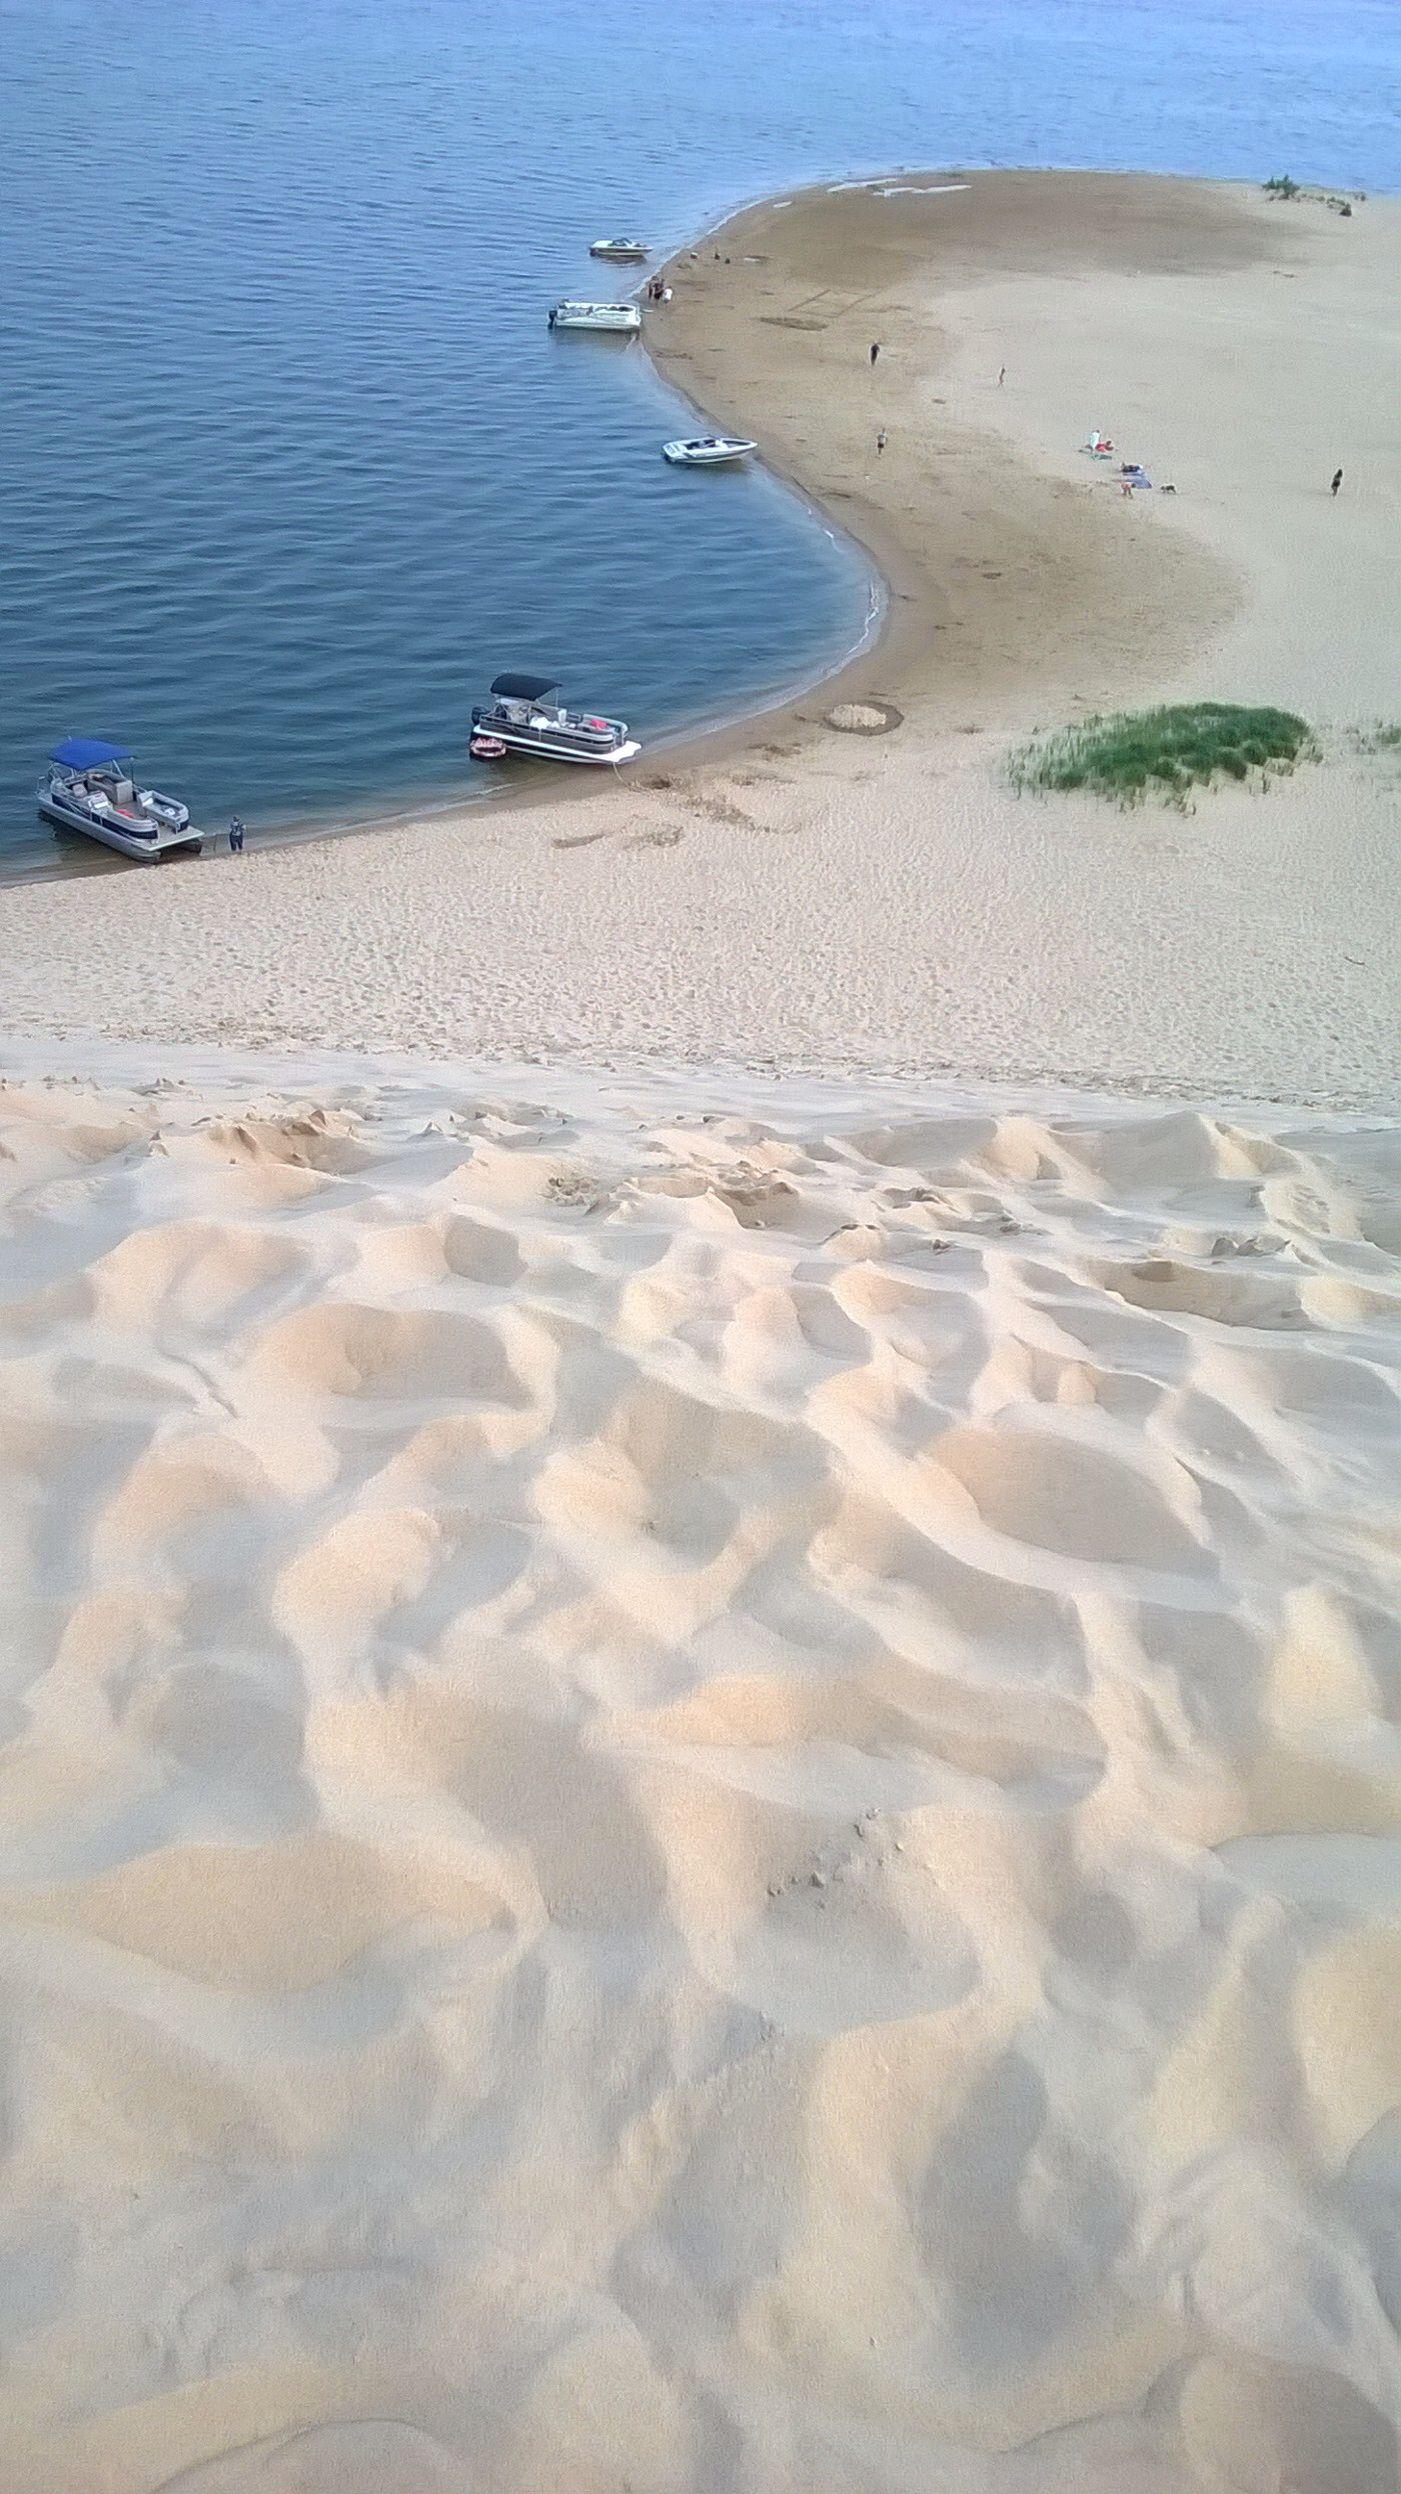 Razorback Sand Dune Overlooking Silver Lake Mears Michigan